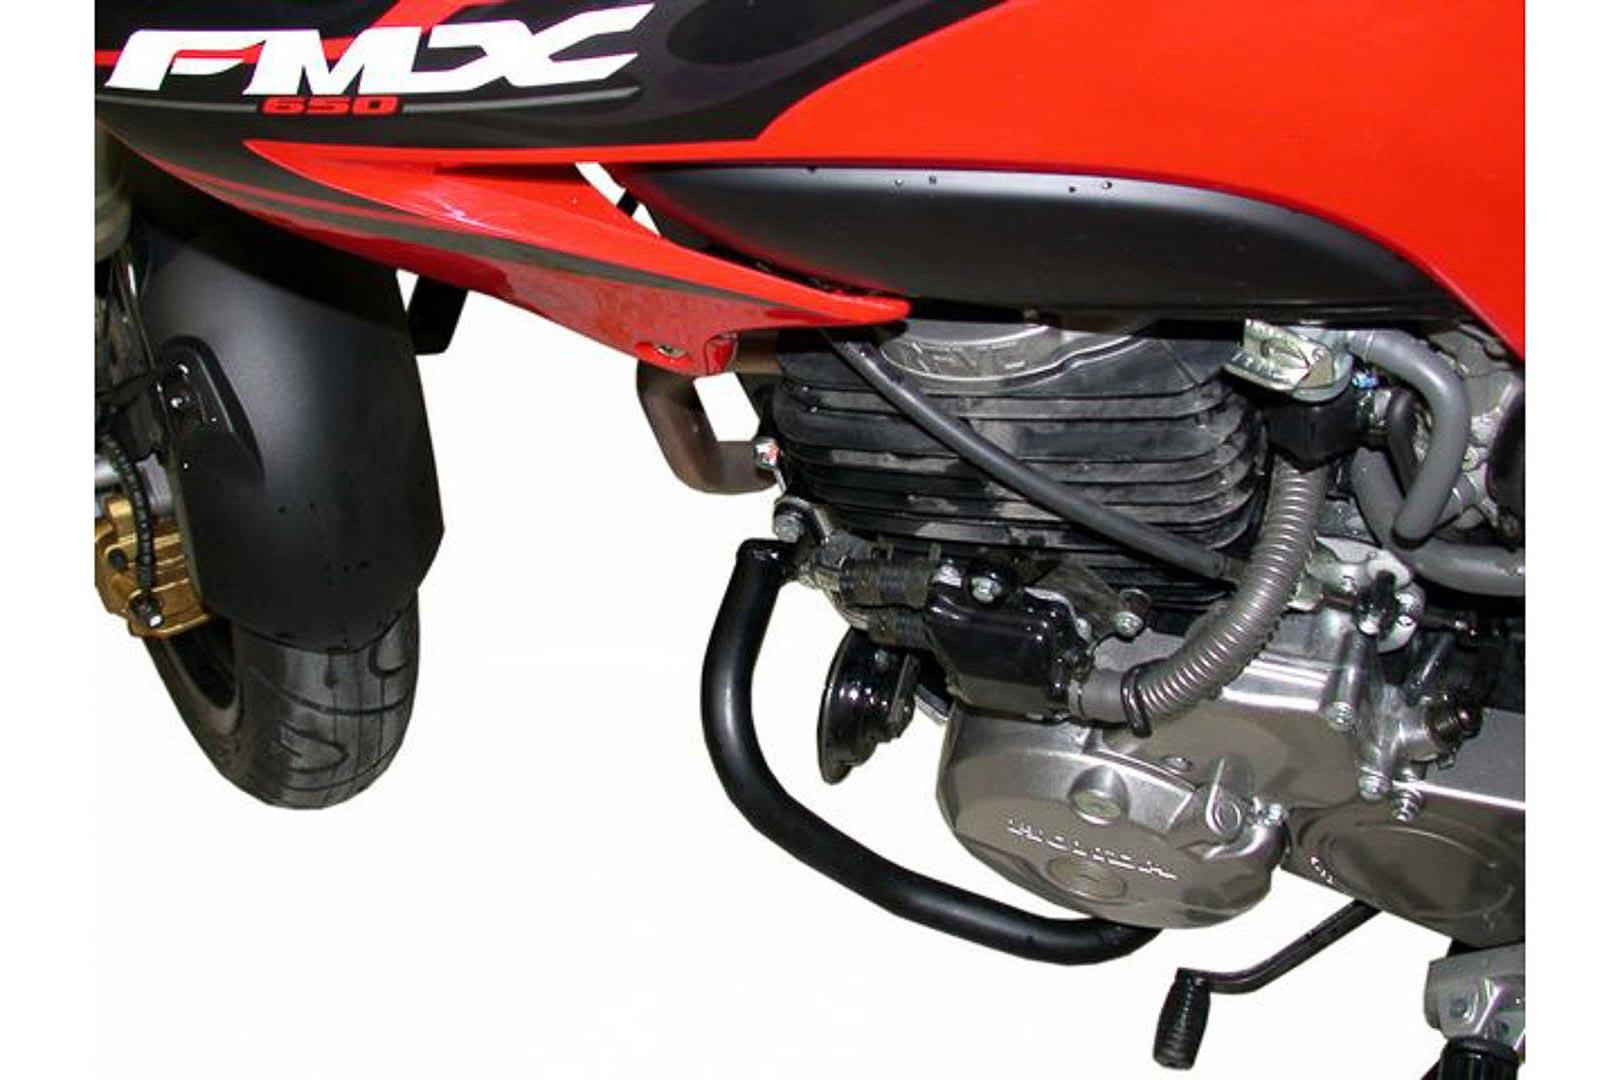 SW-Motech Moottorinsuojarauta Honda FMX650 musta